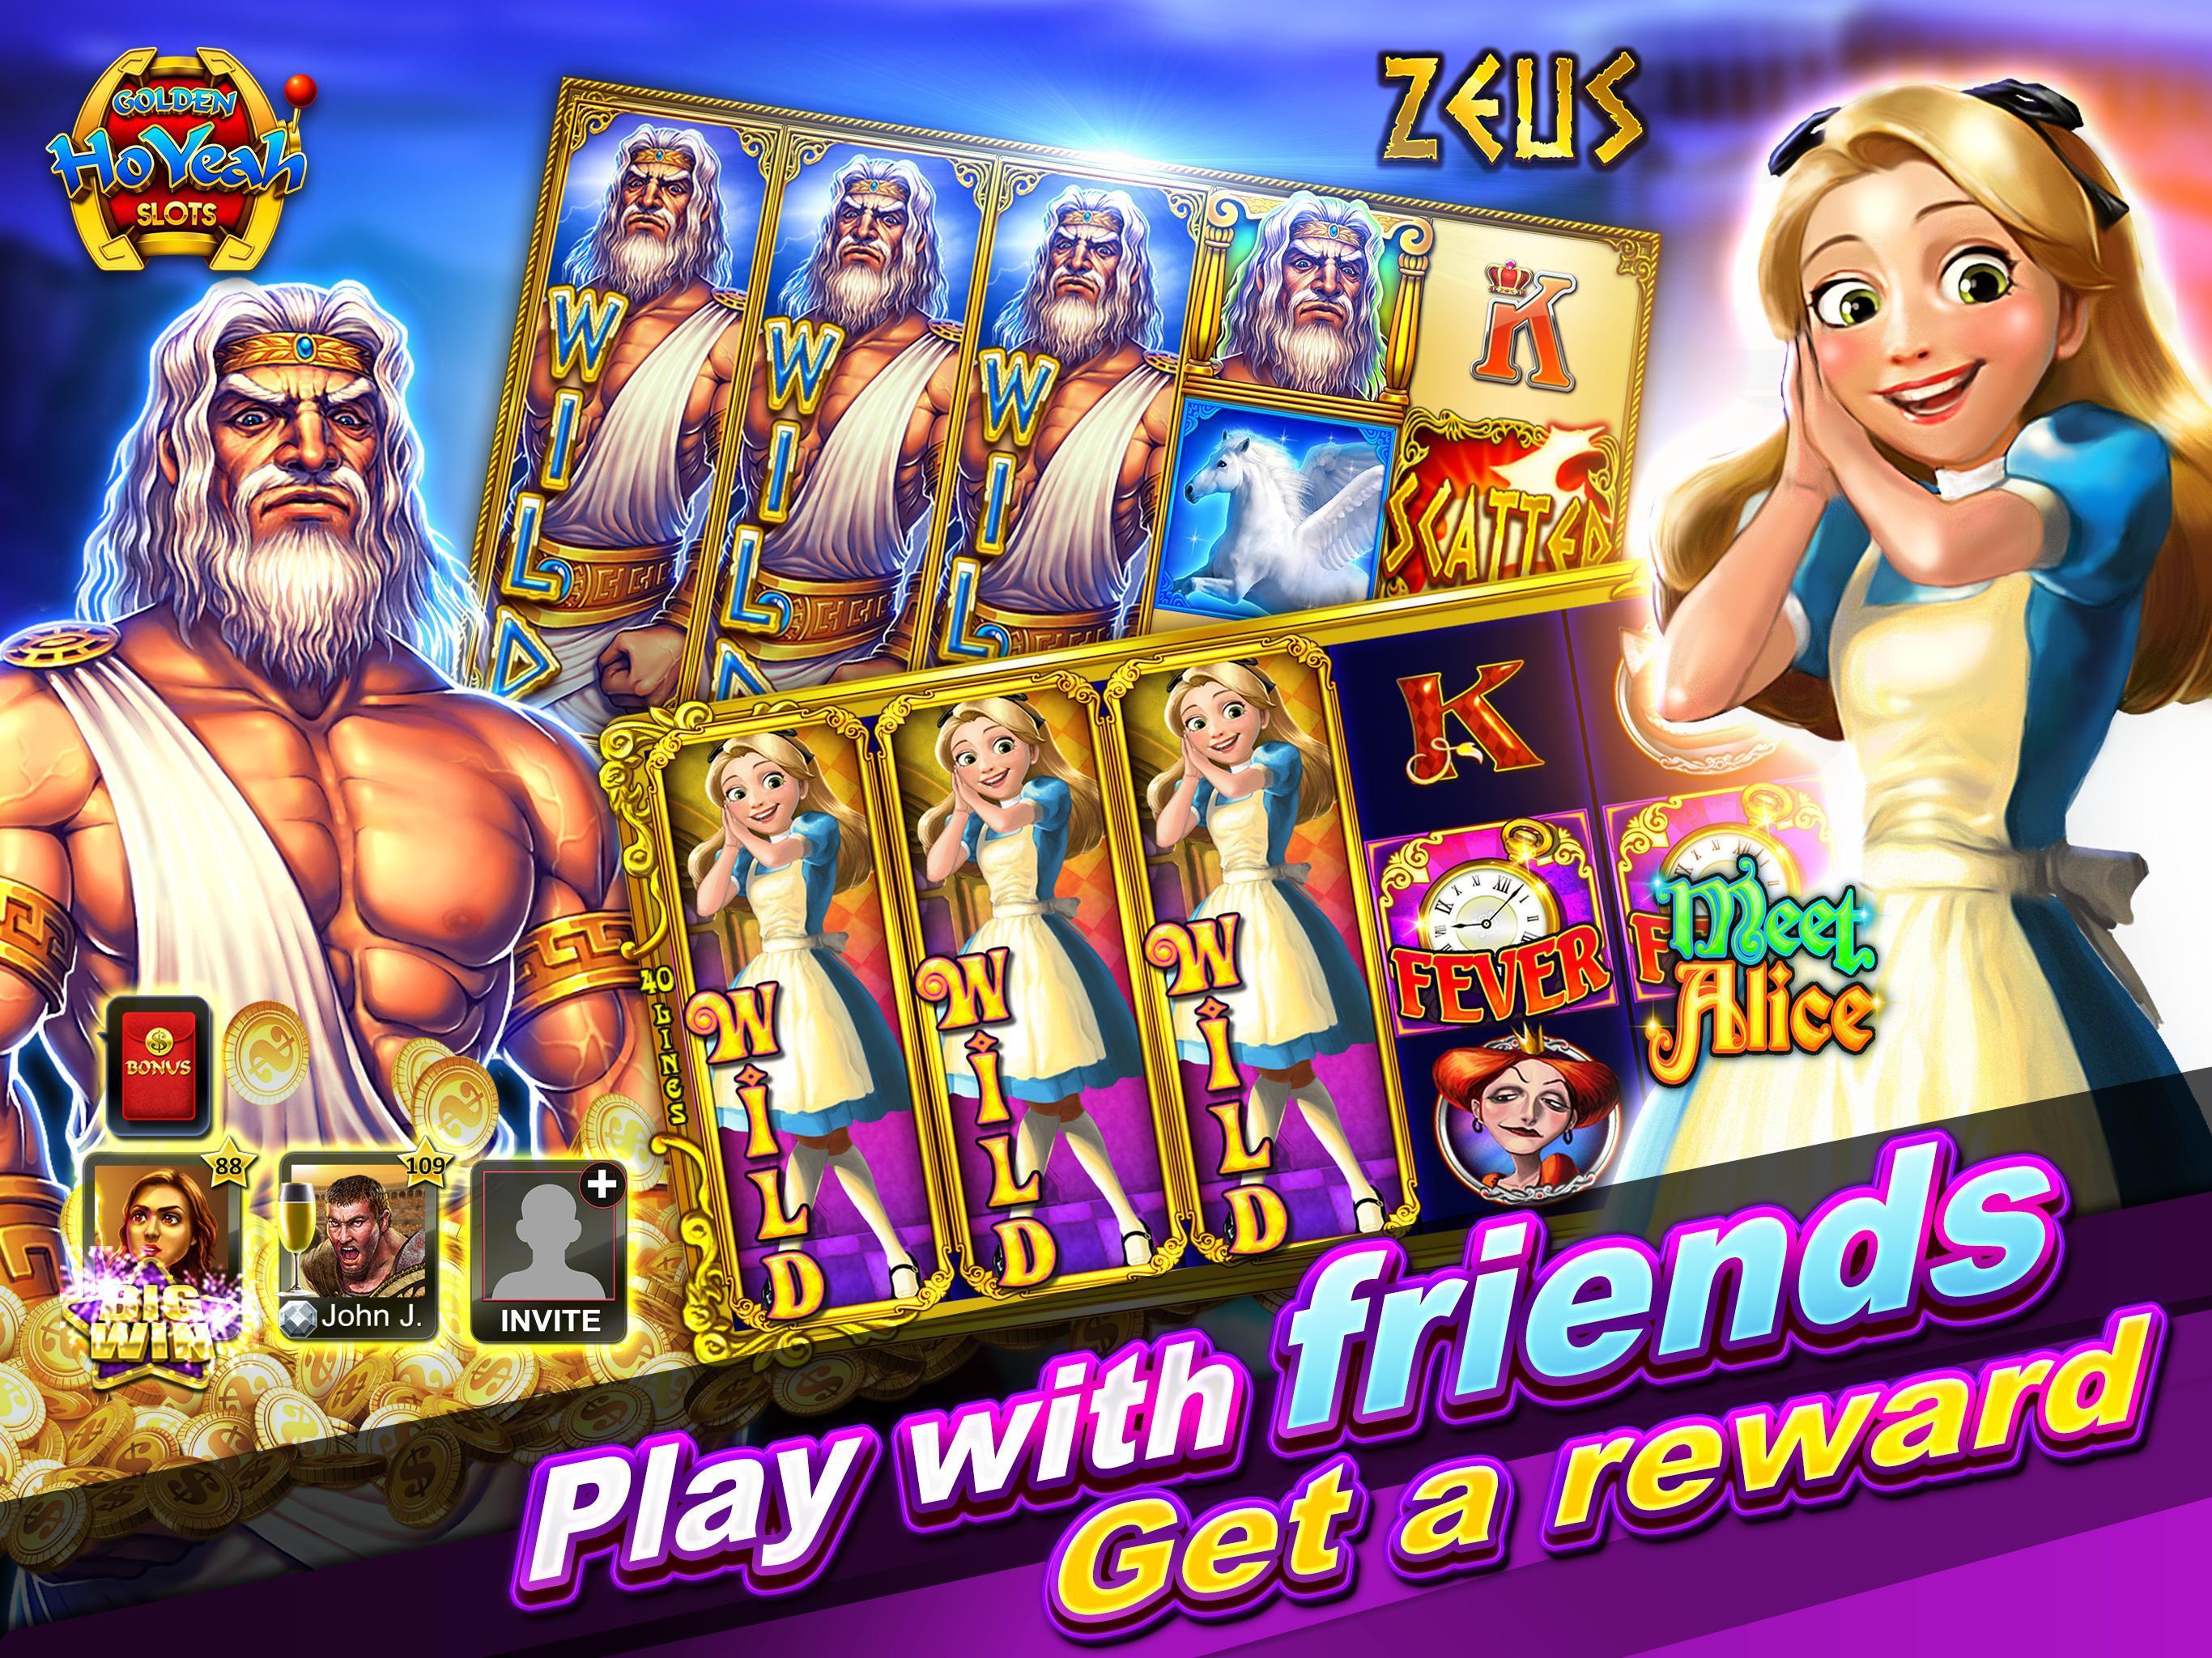 Slots (Golden HoYeah) - Casino Slots 2.5.7 Screenshot 13